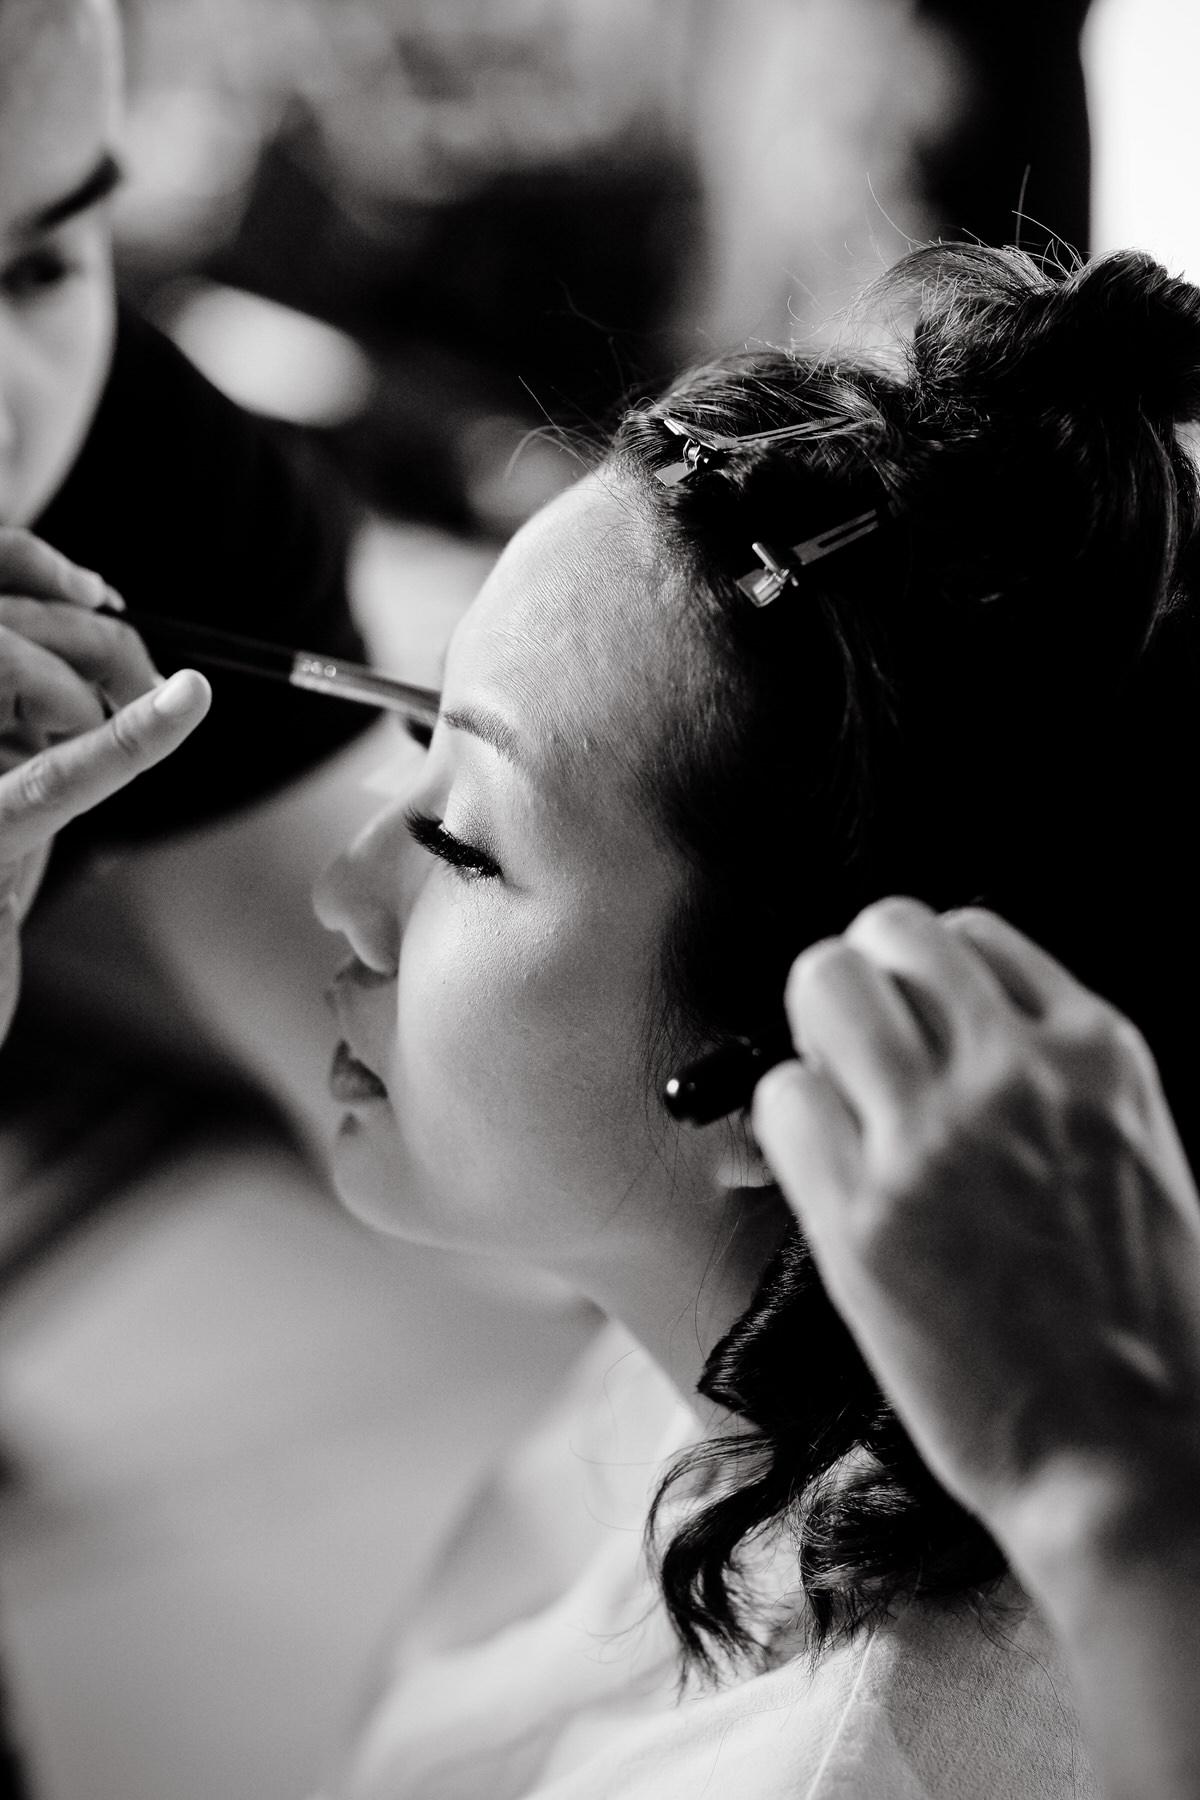 Danang-Hoi An-Wedding-Photography-302.jpg